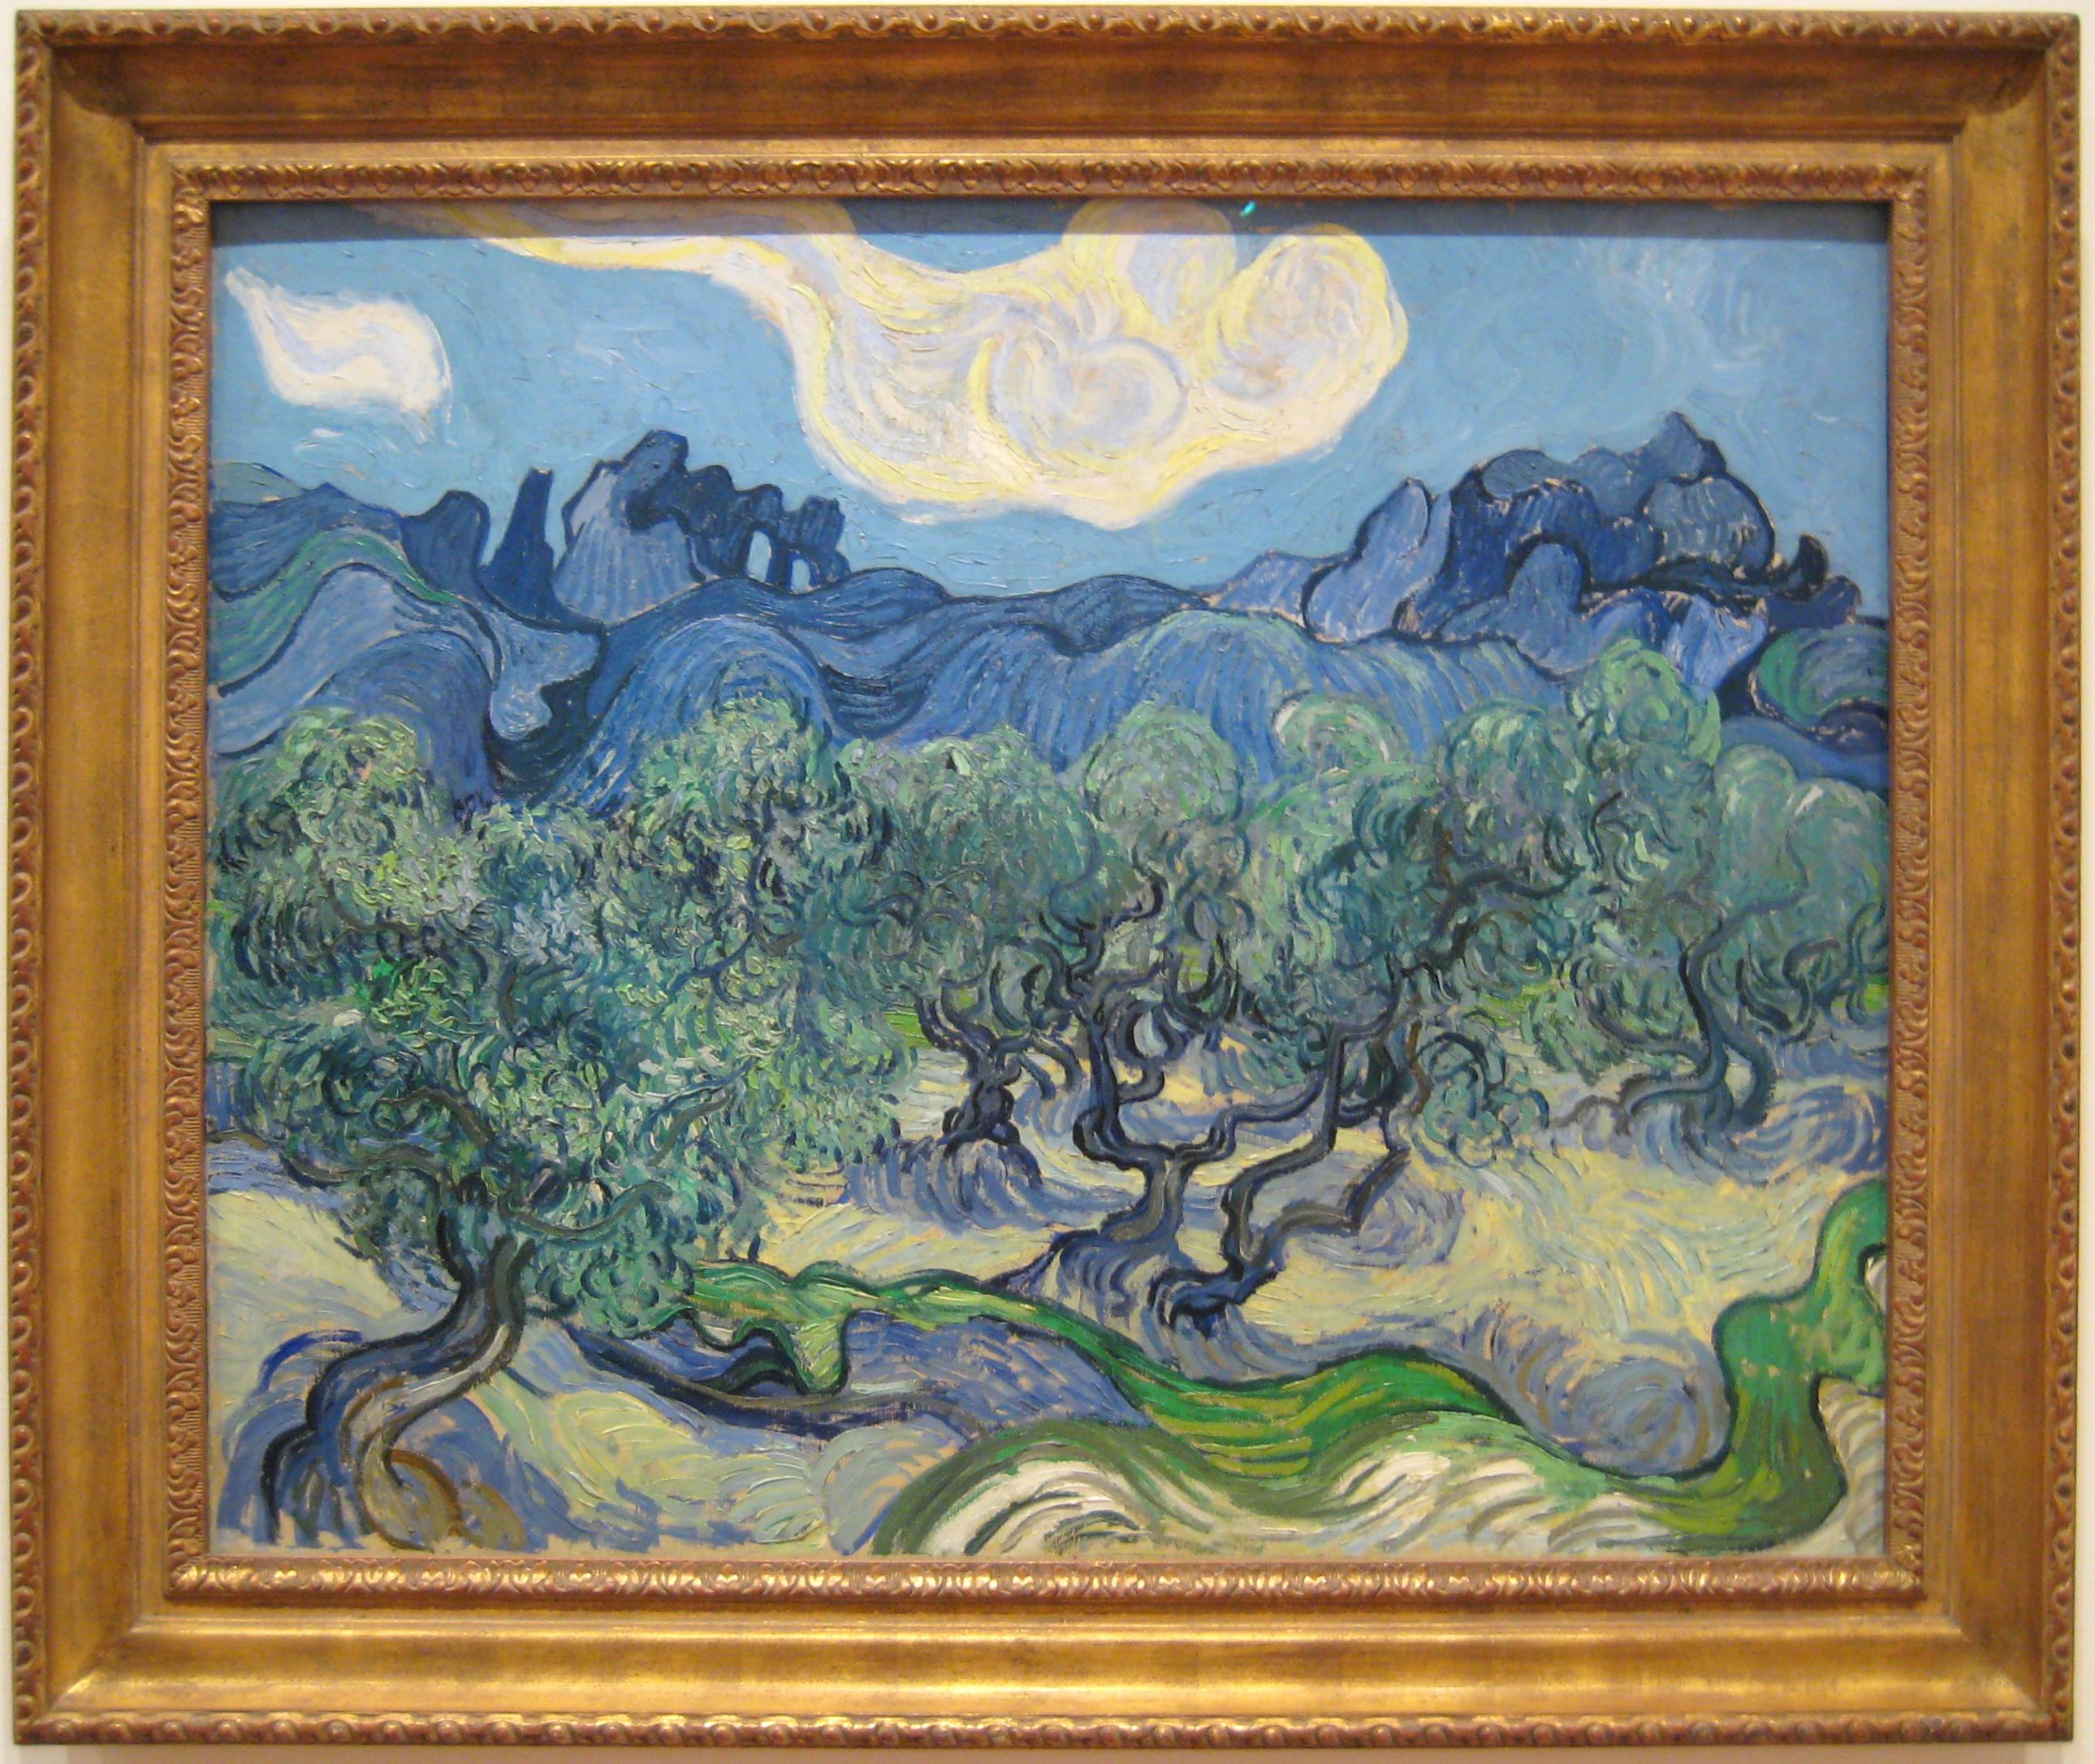 Vincent Van Gogh: The Olive Trees (1889)